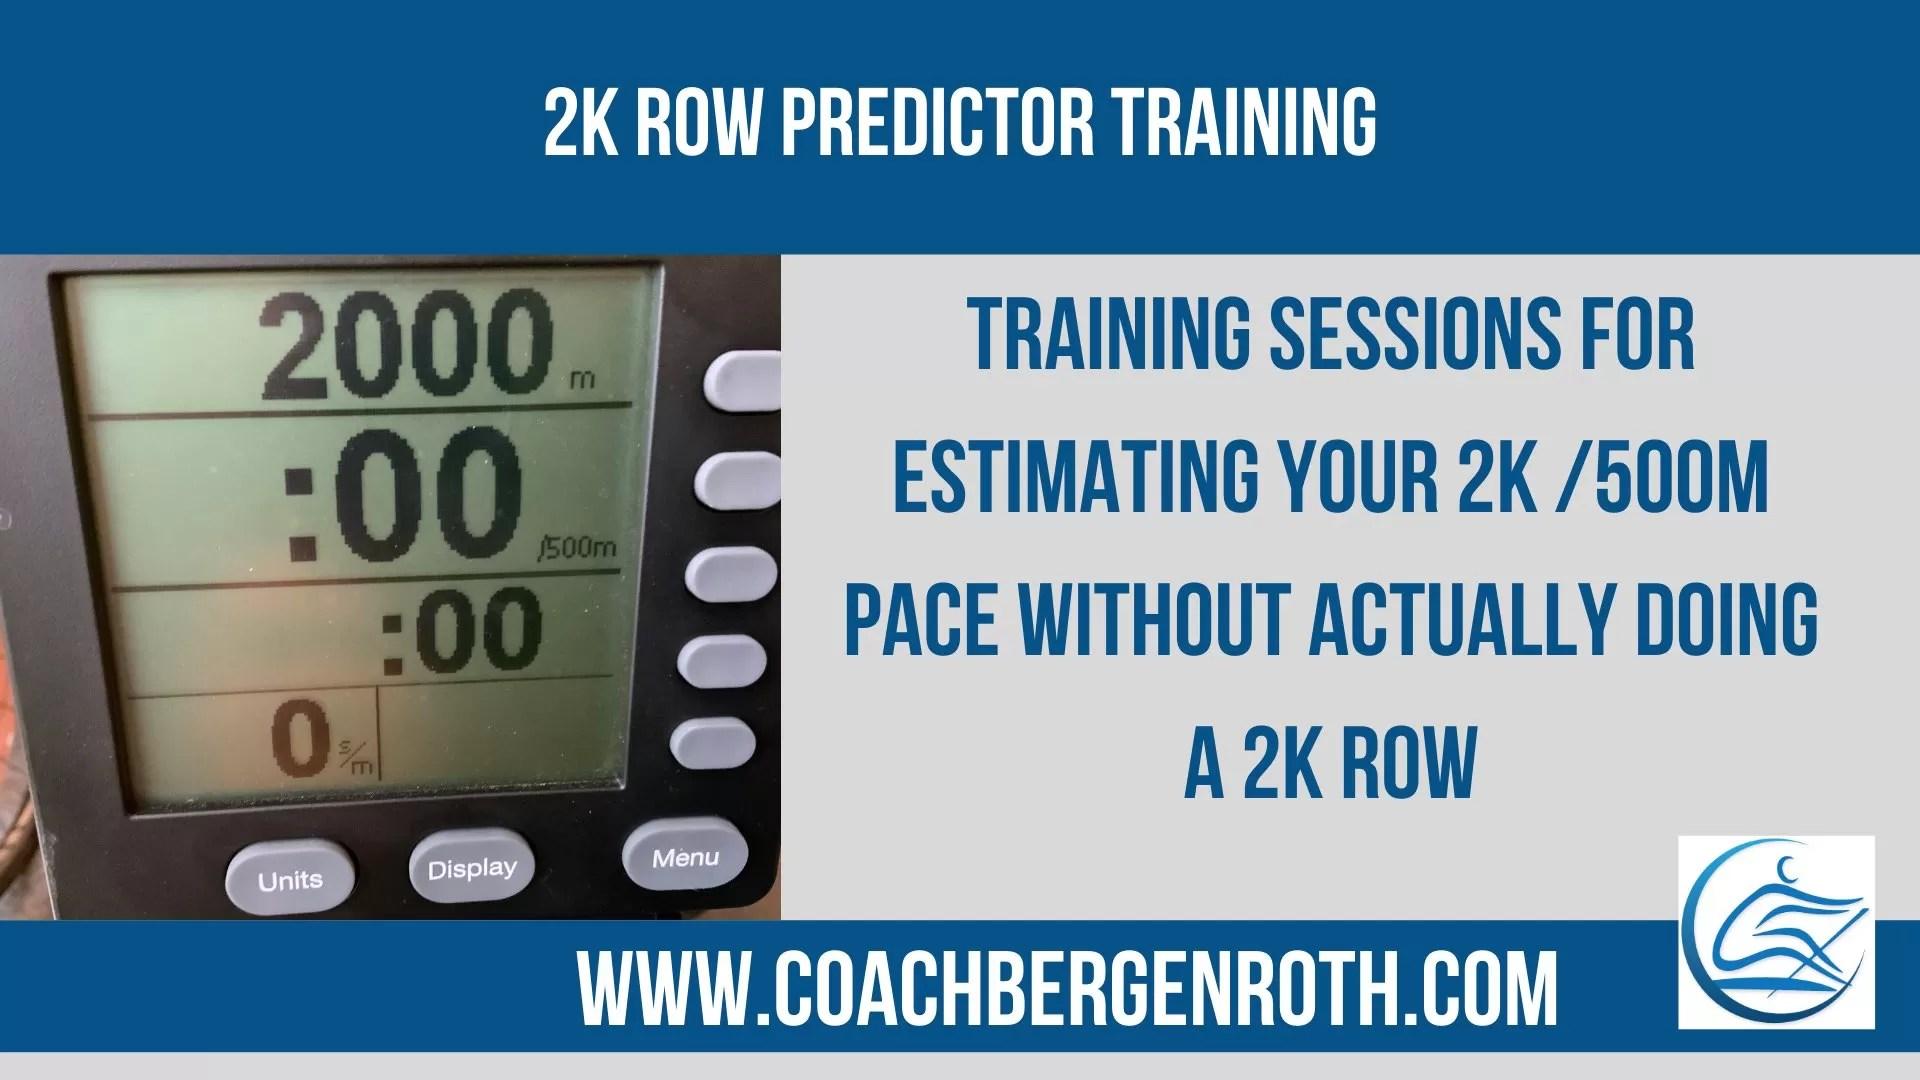 2k Row Predictor Training